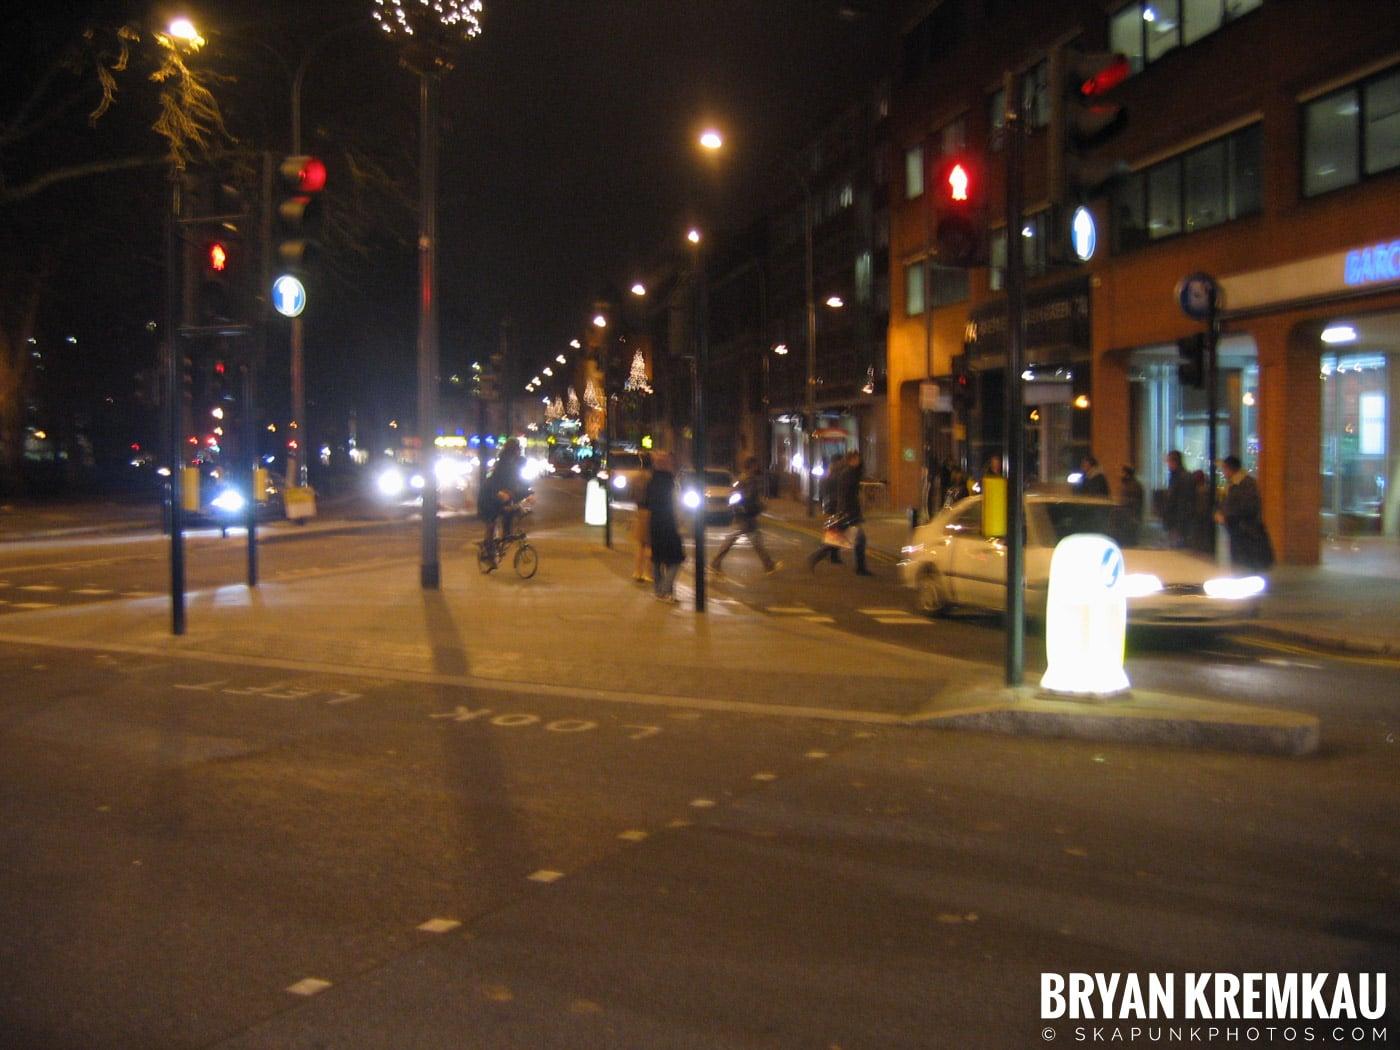 London, England - Day 1 - 12.16.05 (7)